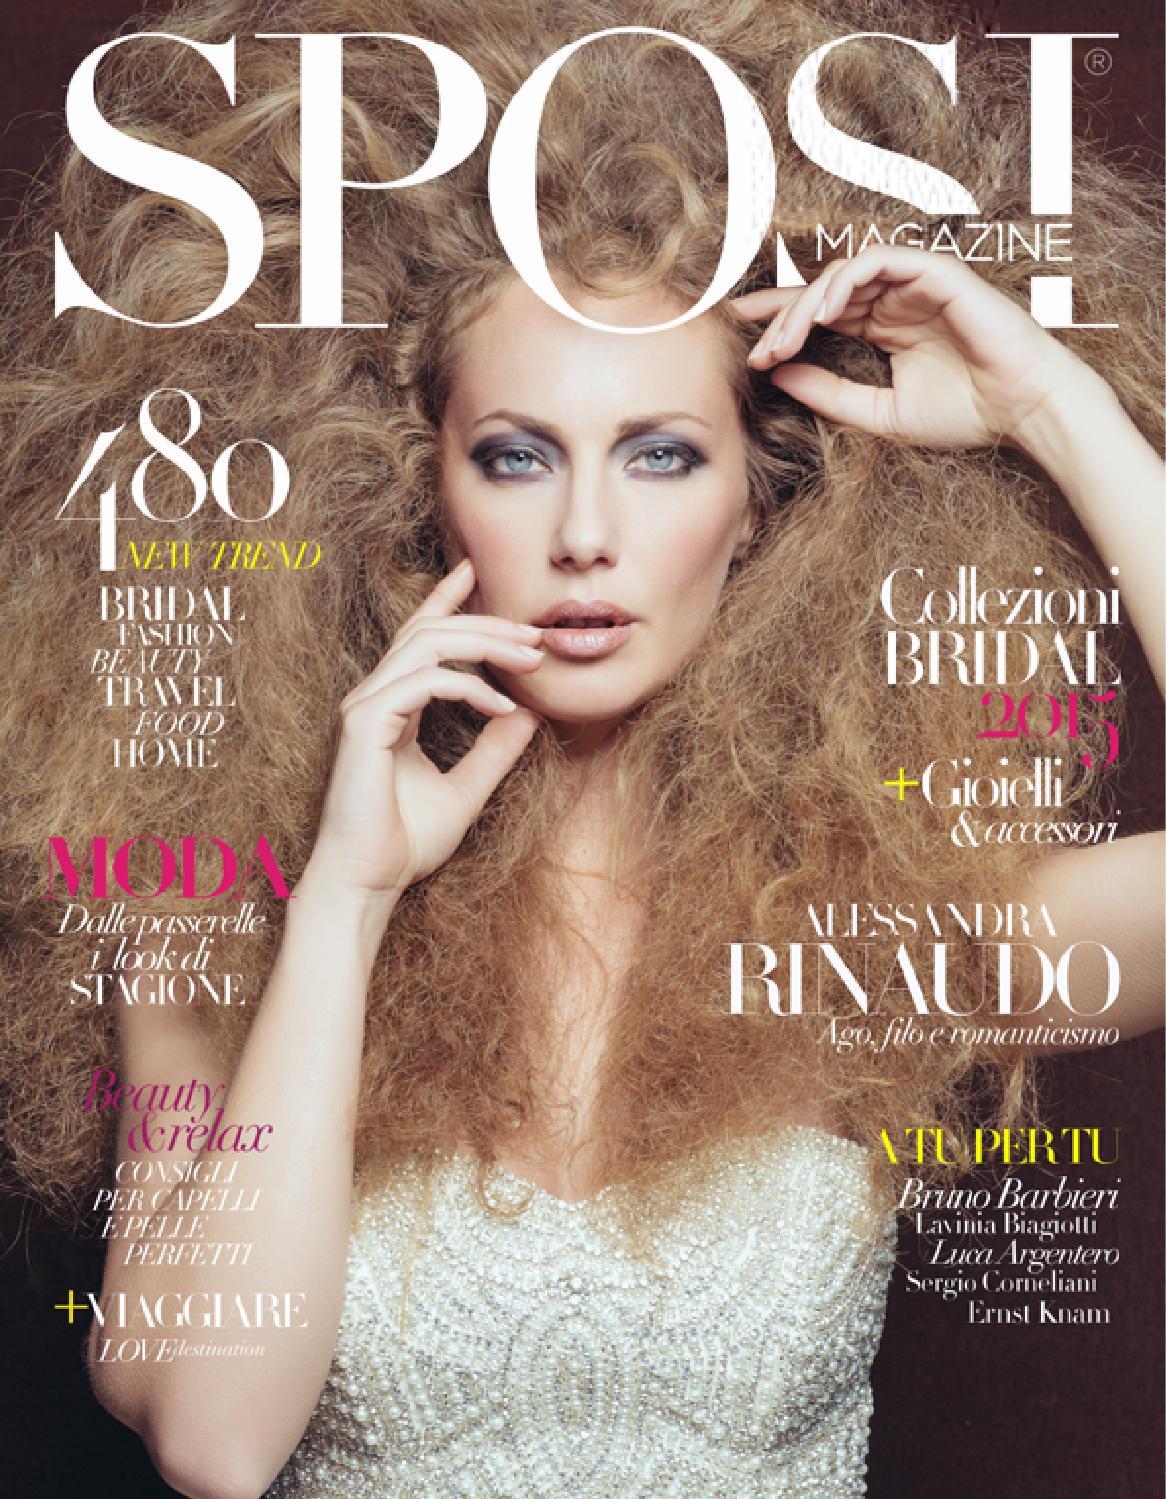 Sposi magazine by Sposi Magazine - issuu 52a7e57bfe8